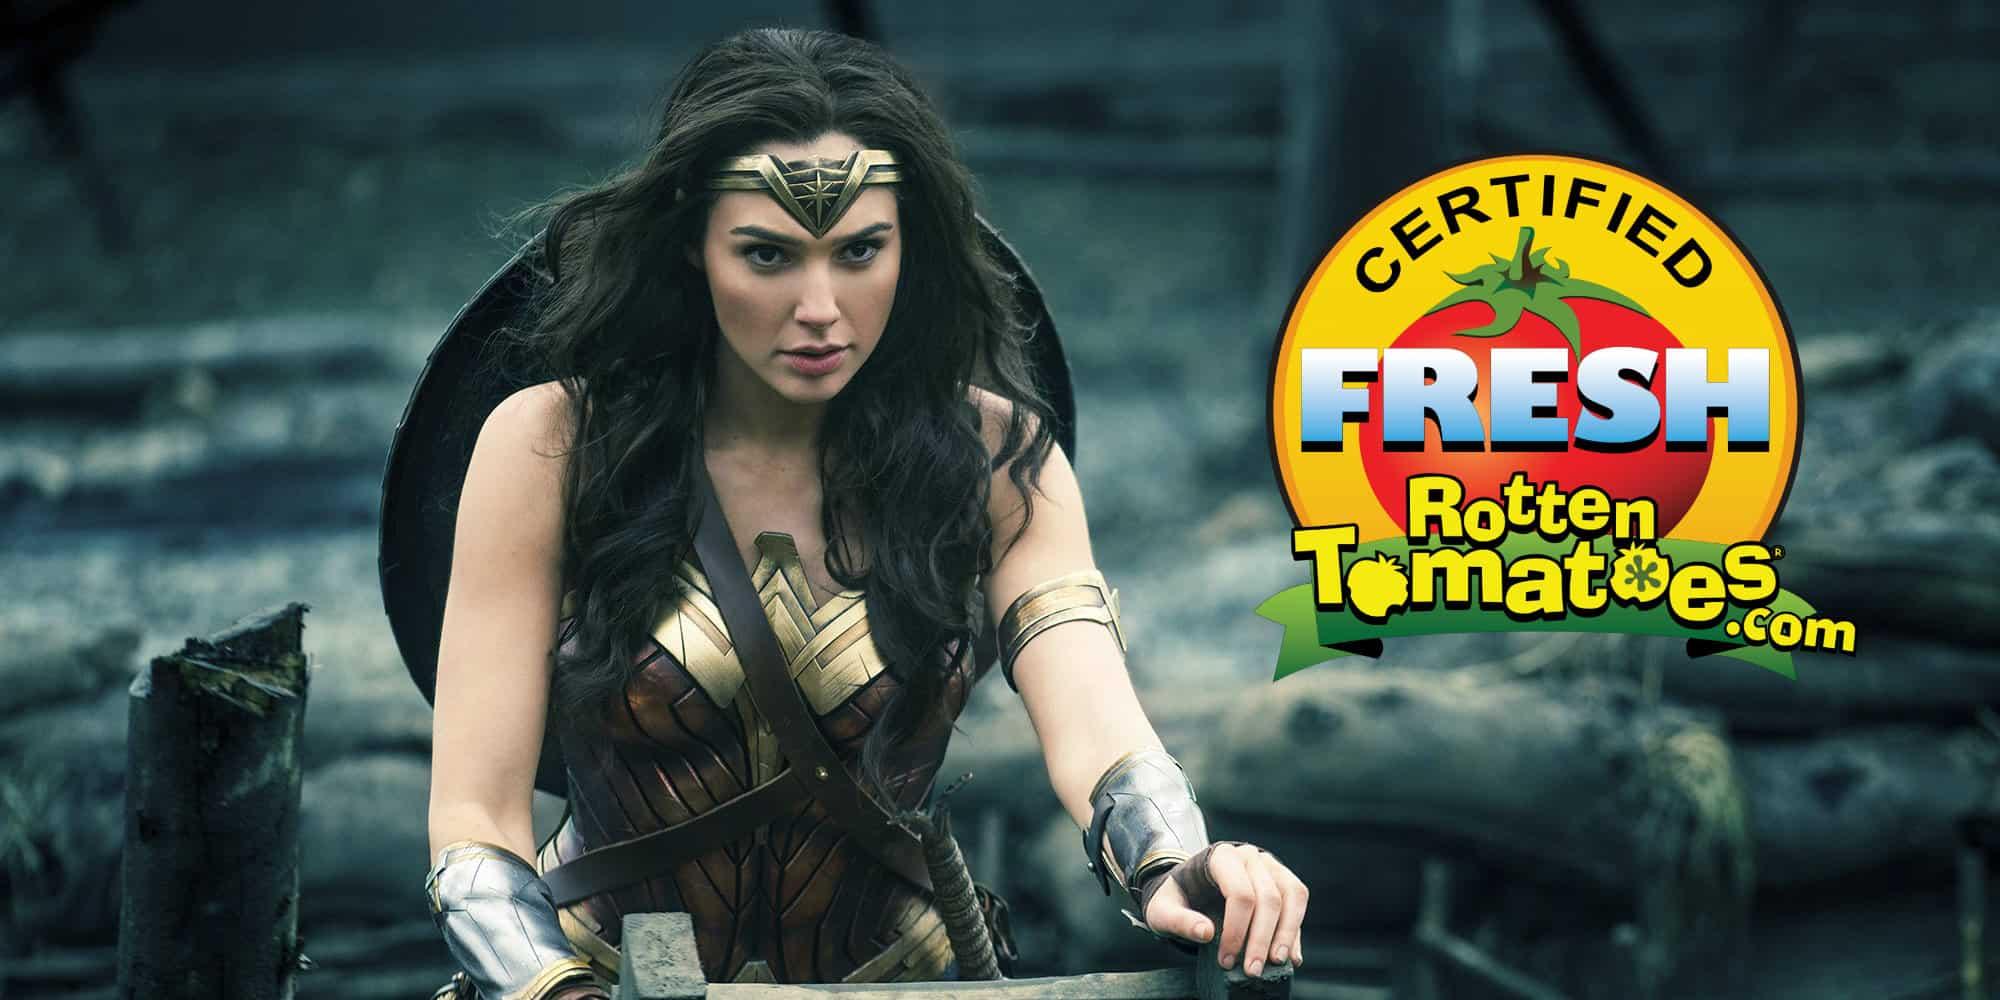 Positive Wonder Woman Review Allegedly Prove Critics\' Anti-DC Bias?